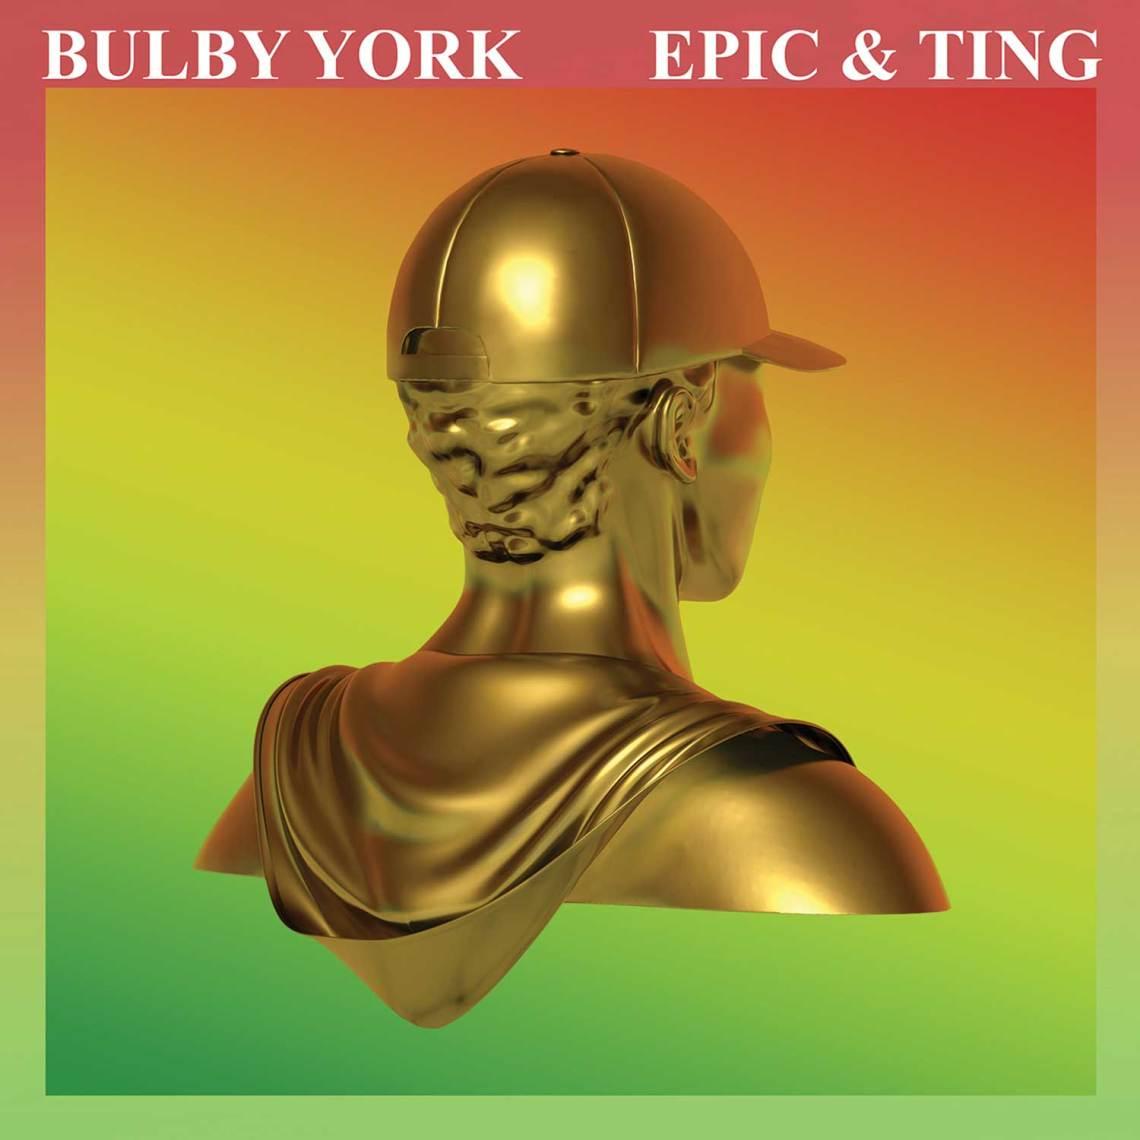 bulby-york-epic-ting